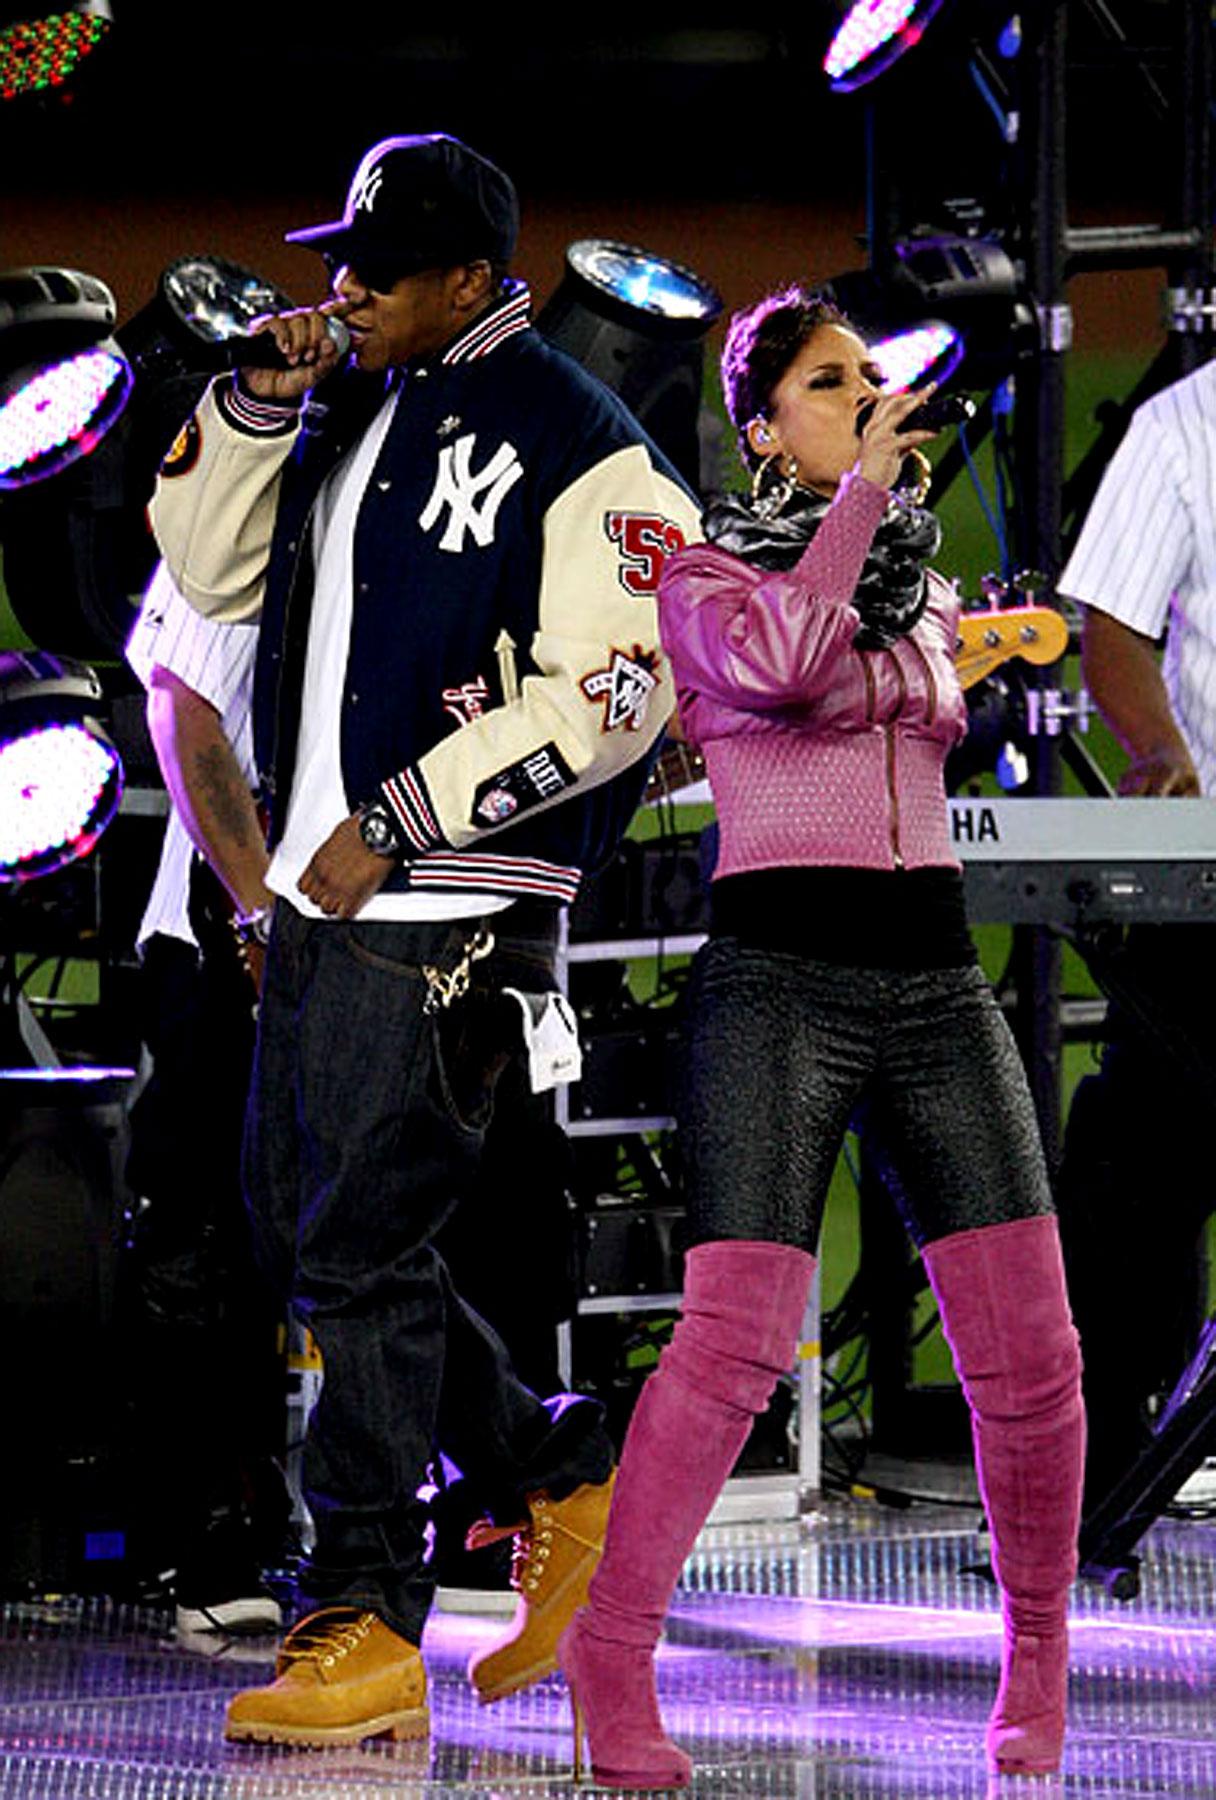 VIDEO: Jay-Z and Alicia Keys Do the World Series